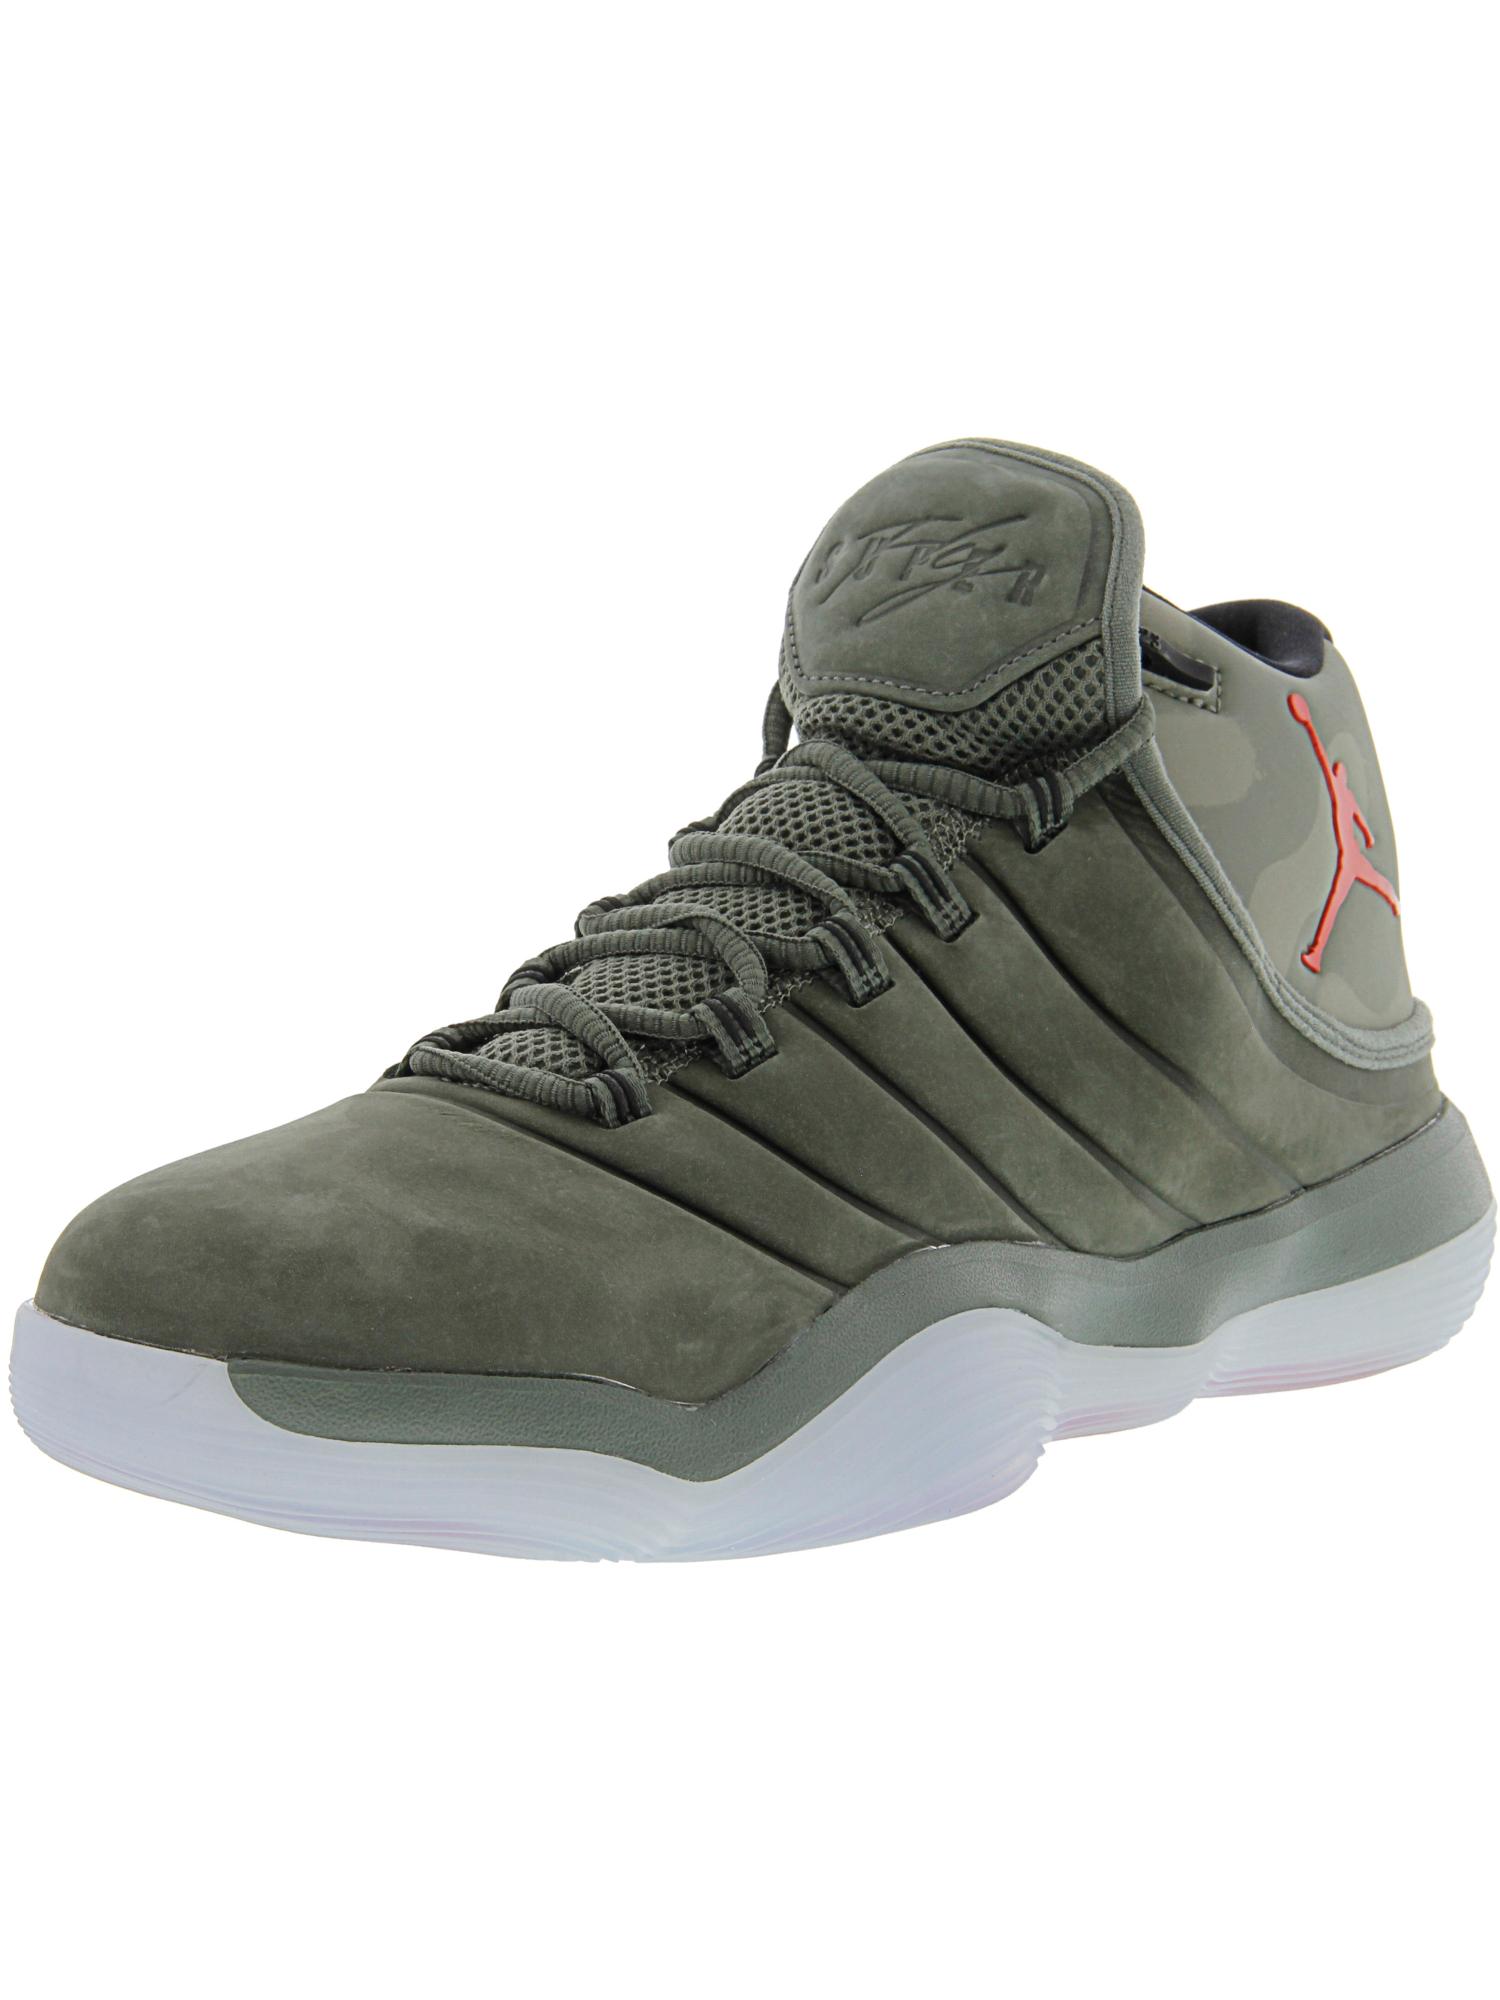 f3a64c6101a9 Nike Men s Jordan Super.Fly 2017 Ankle-High Basketball Shoe